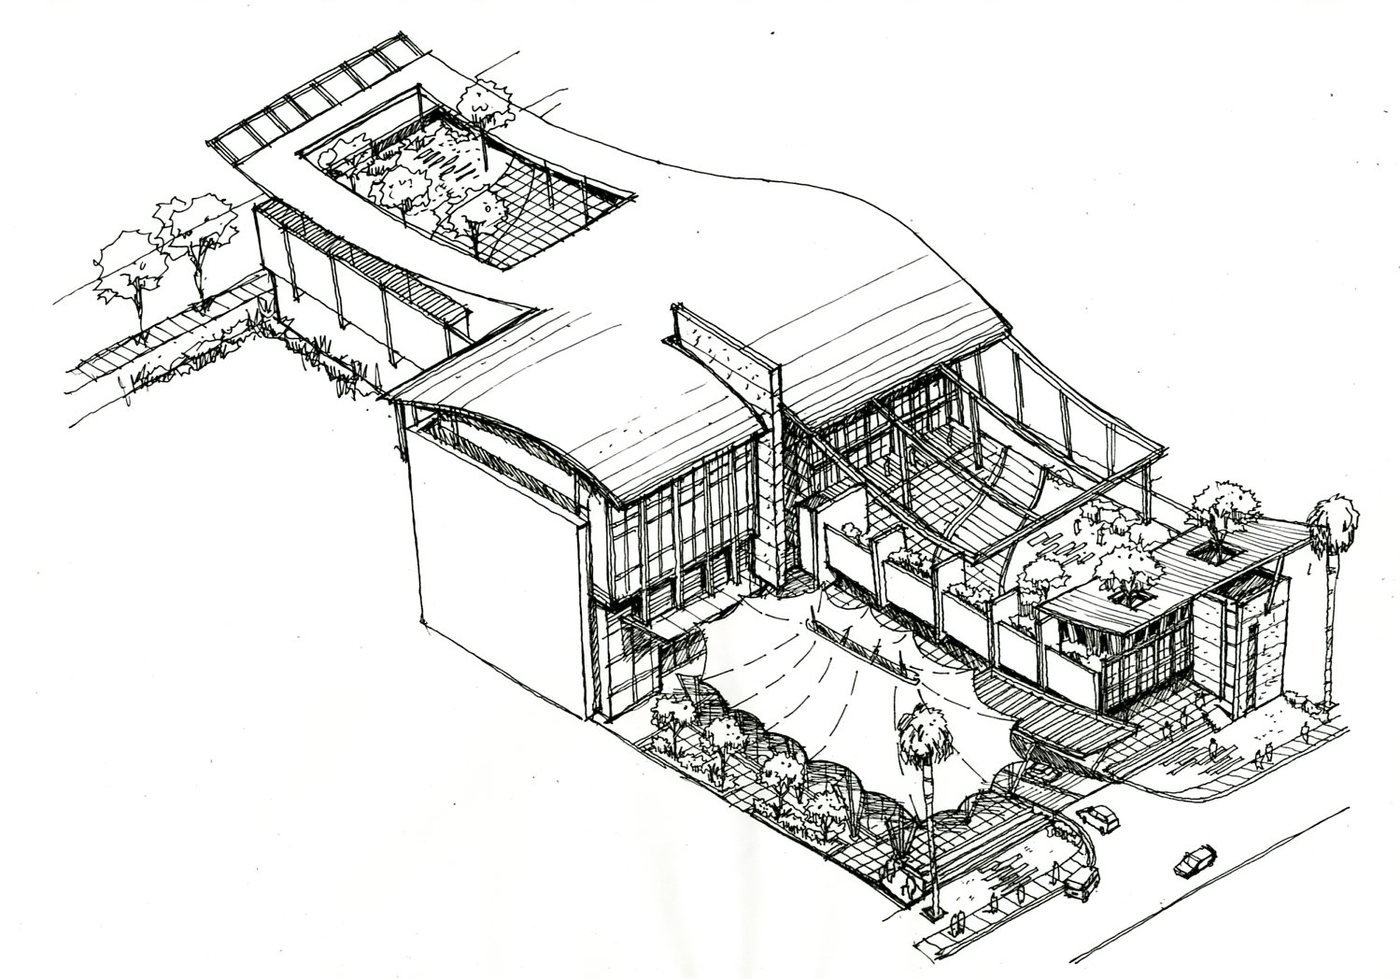 Architectural sketches by MOHD SUHAIMI JAAFAR at Coroflot.com